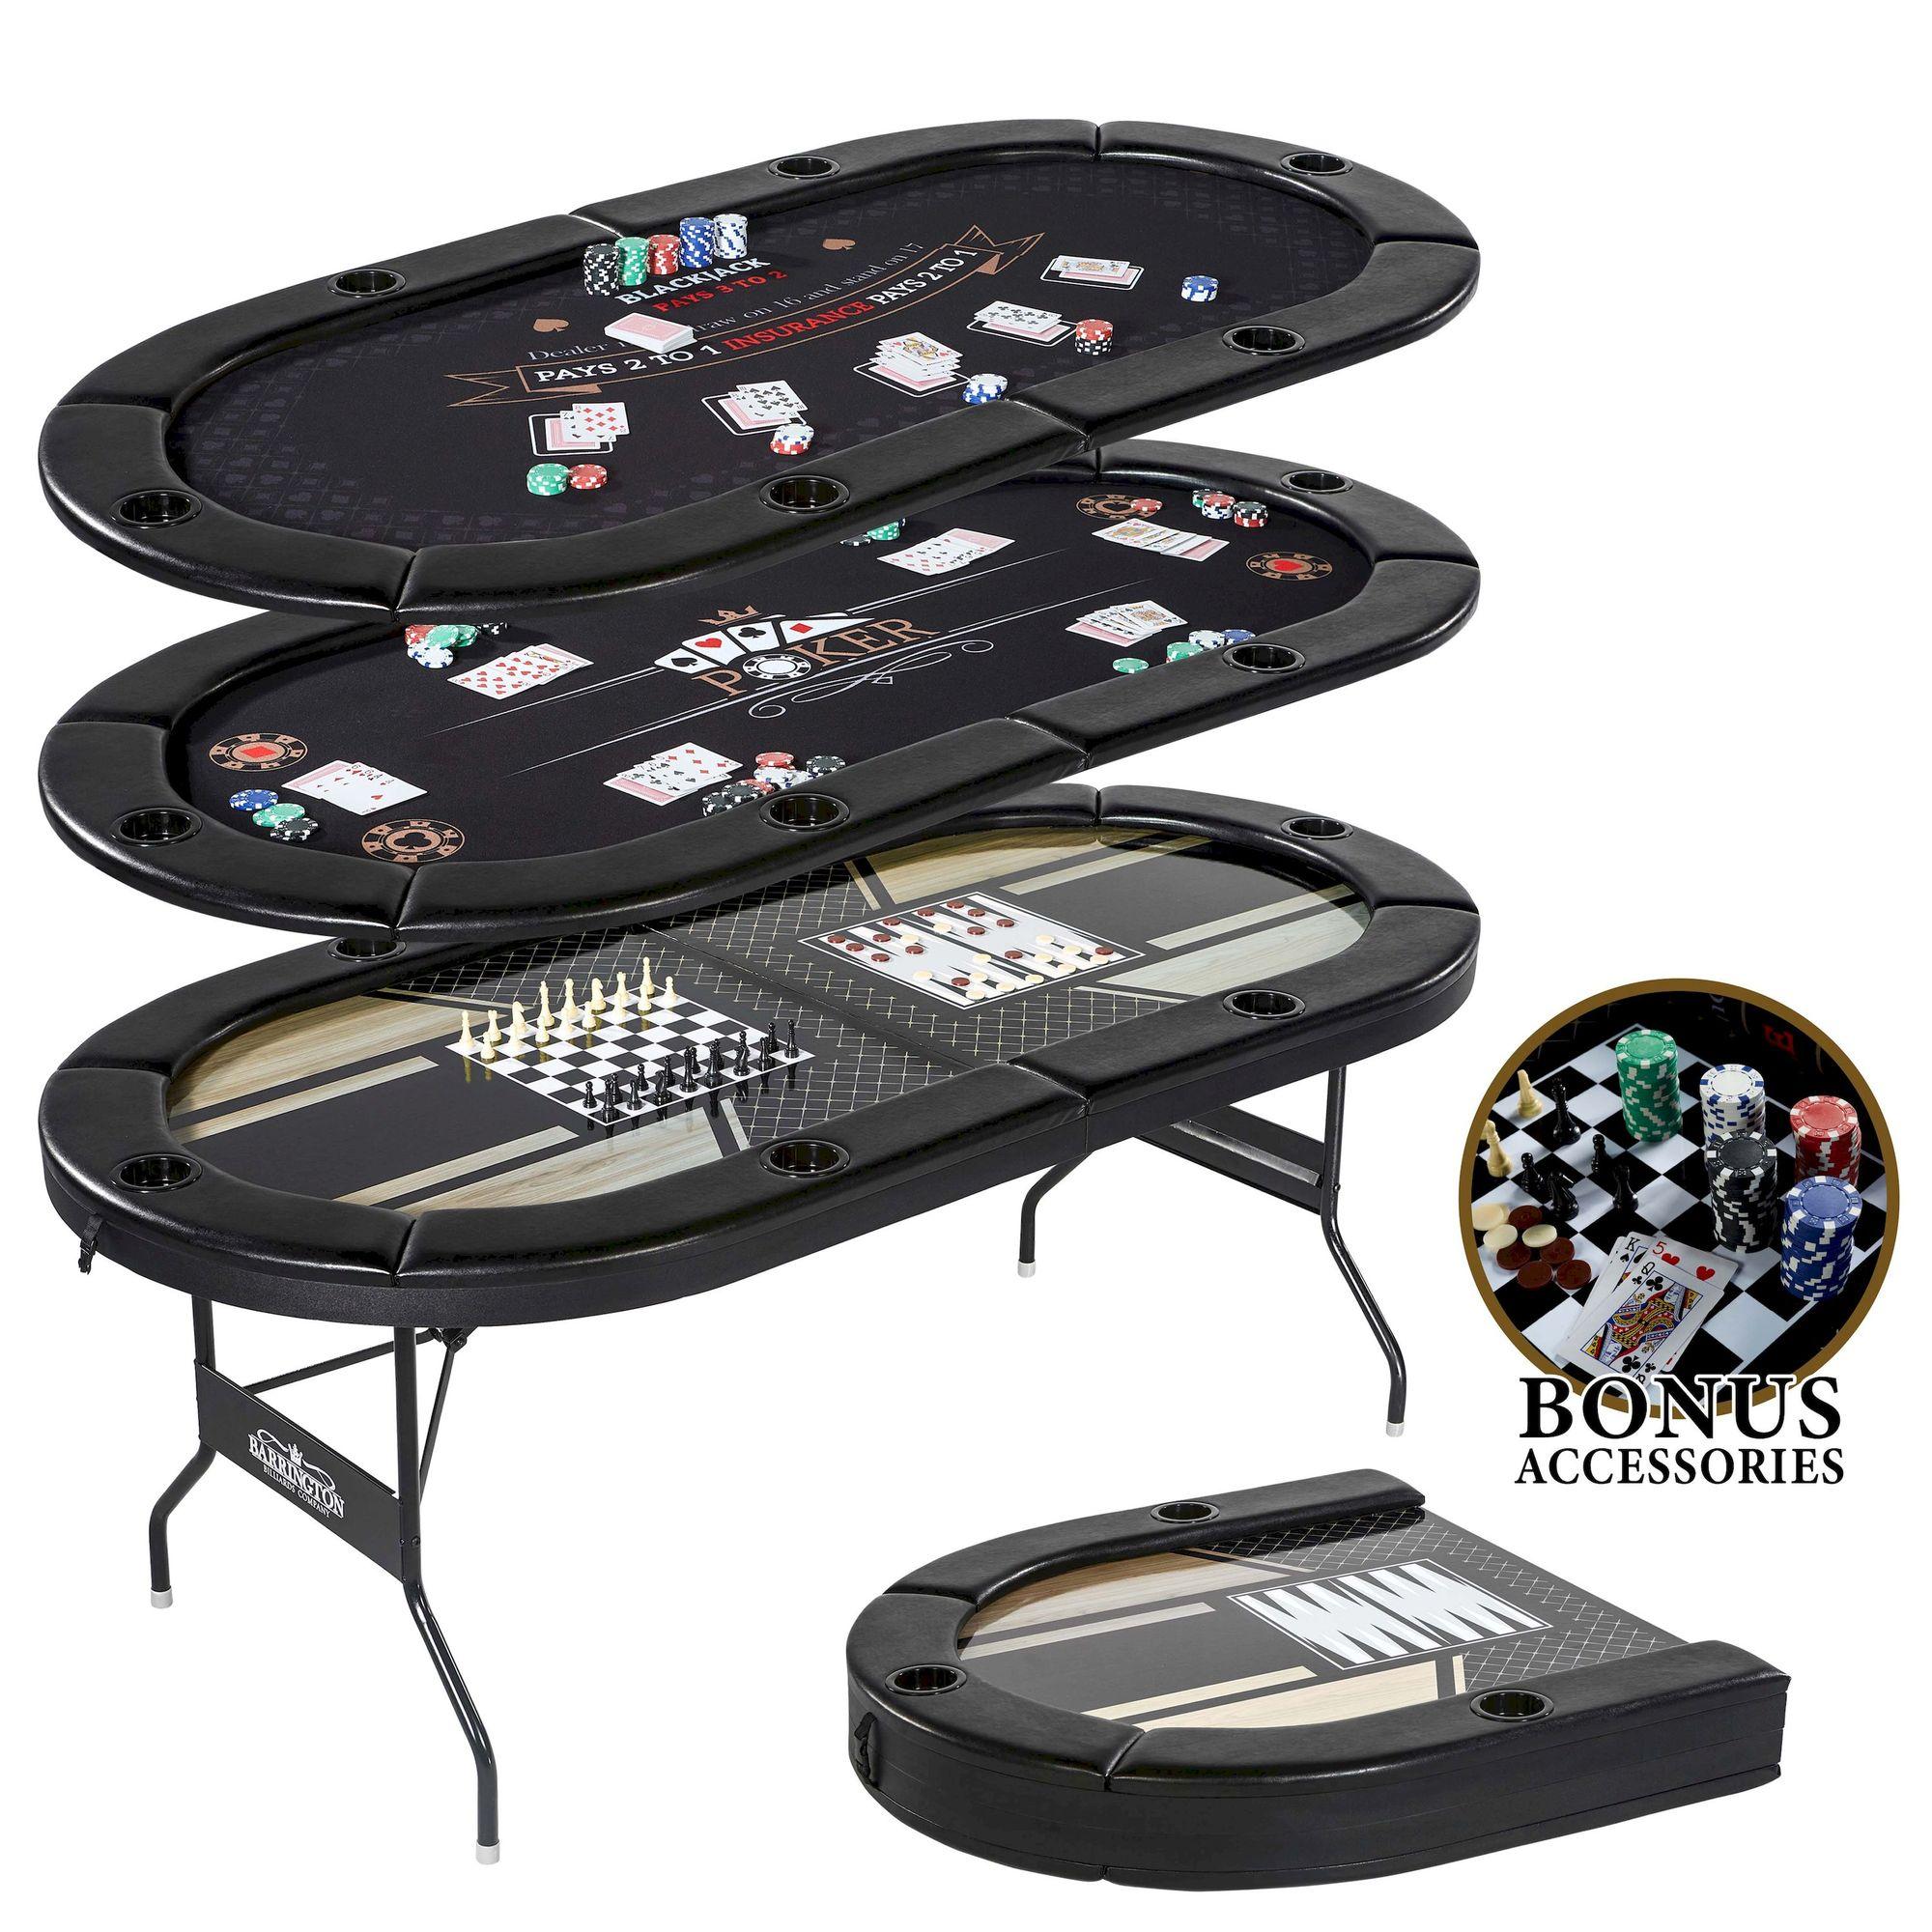 Barrington 6 Players 5 in-1 Multi-Game Poker Table, Blackjack, Poker, Checker, Chess and Backgammon